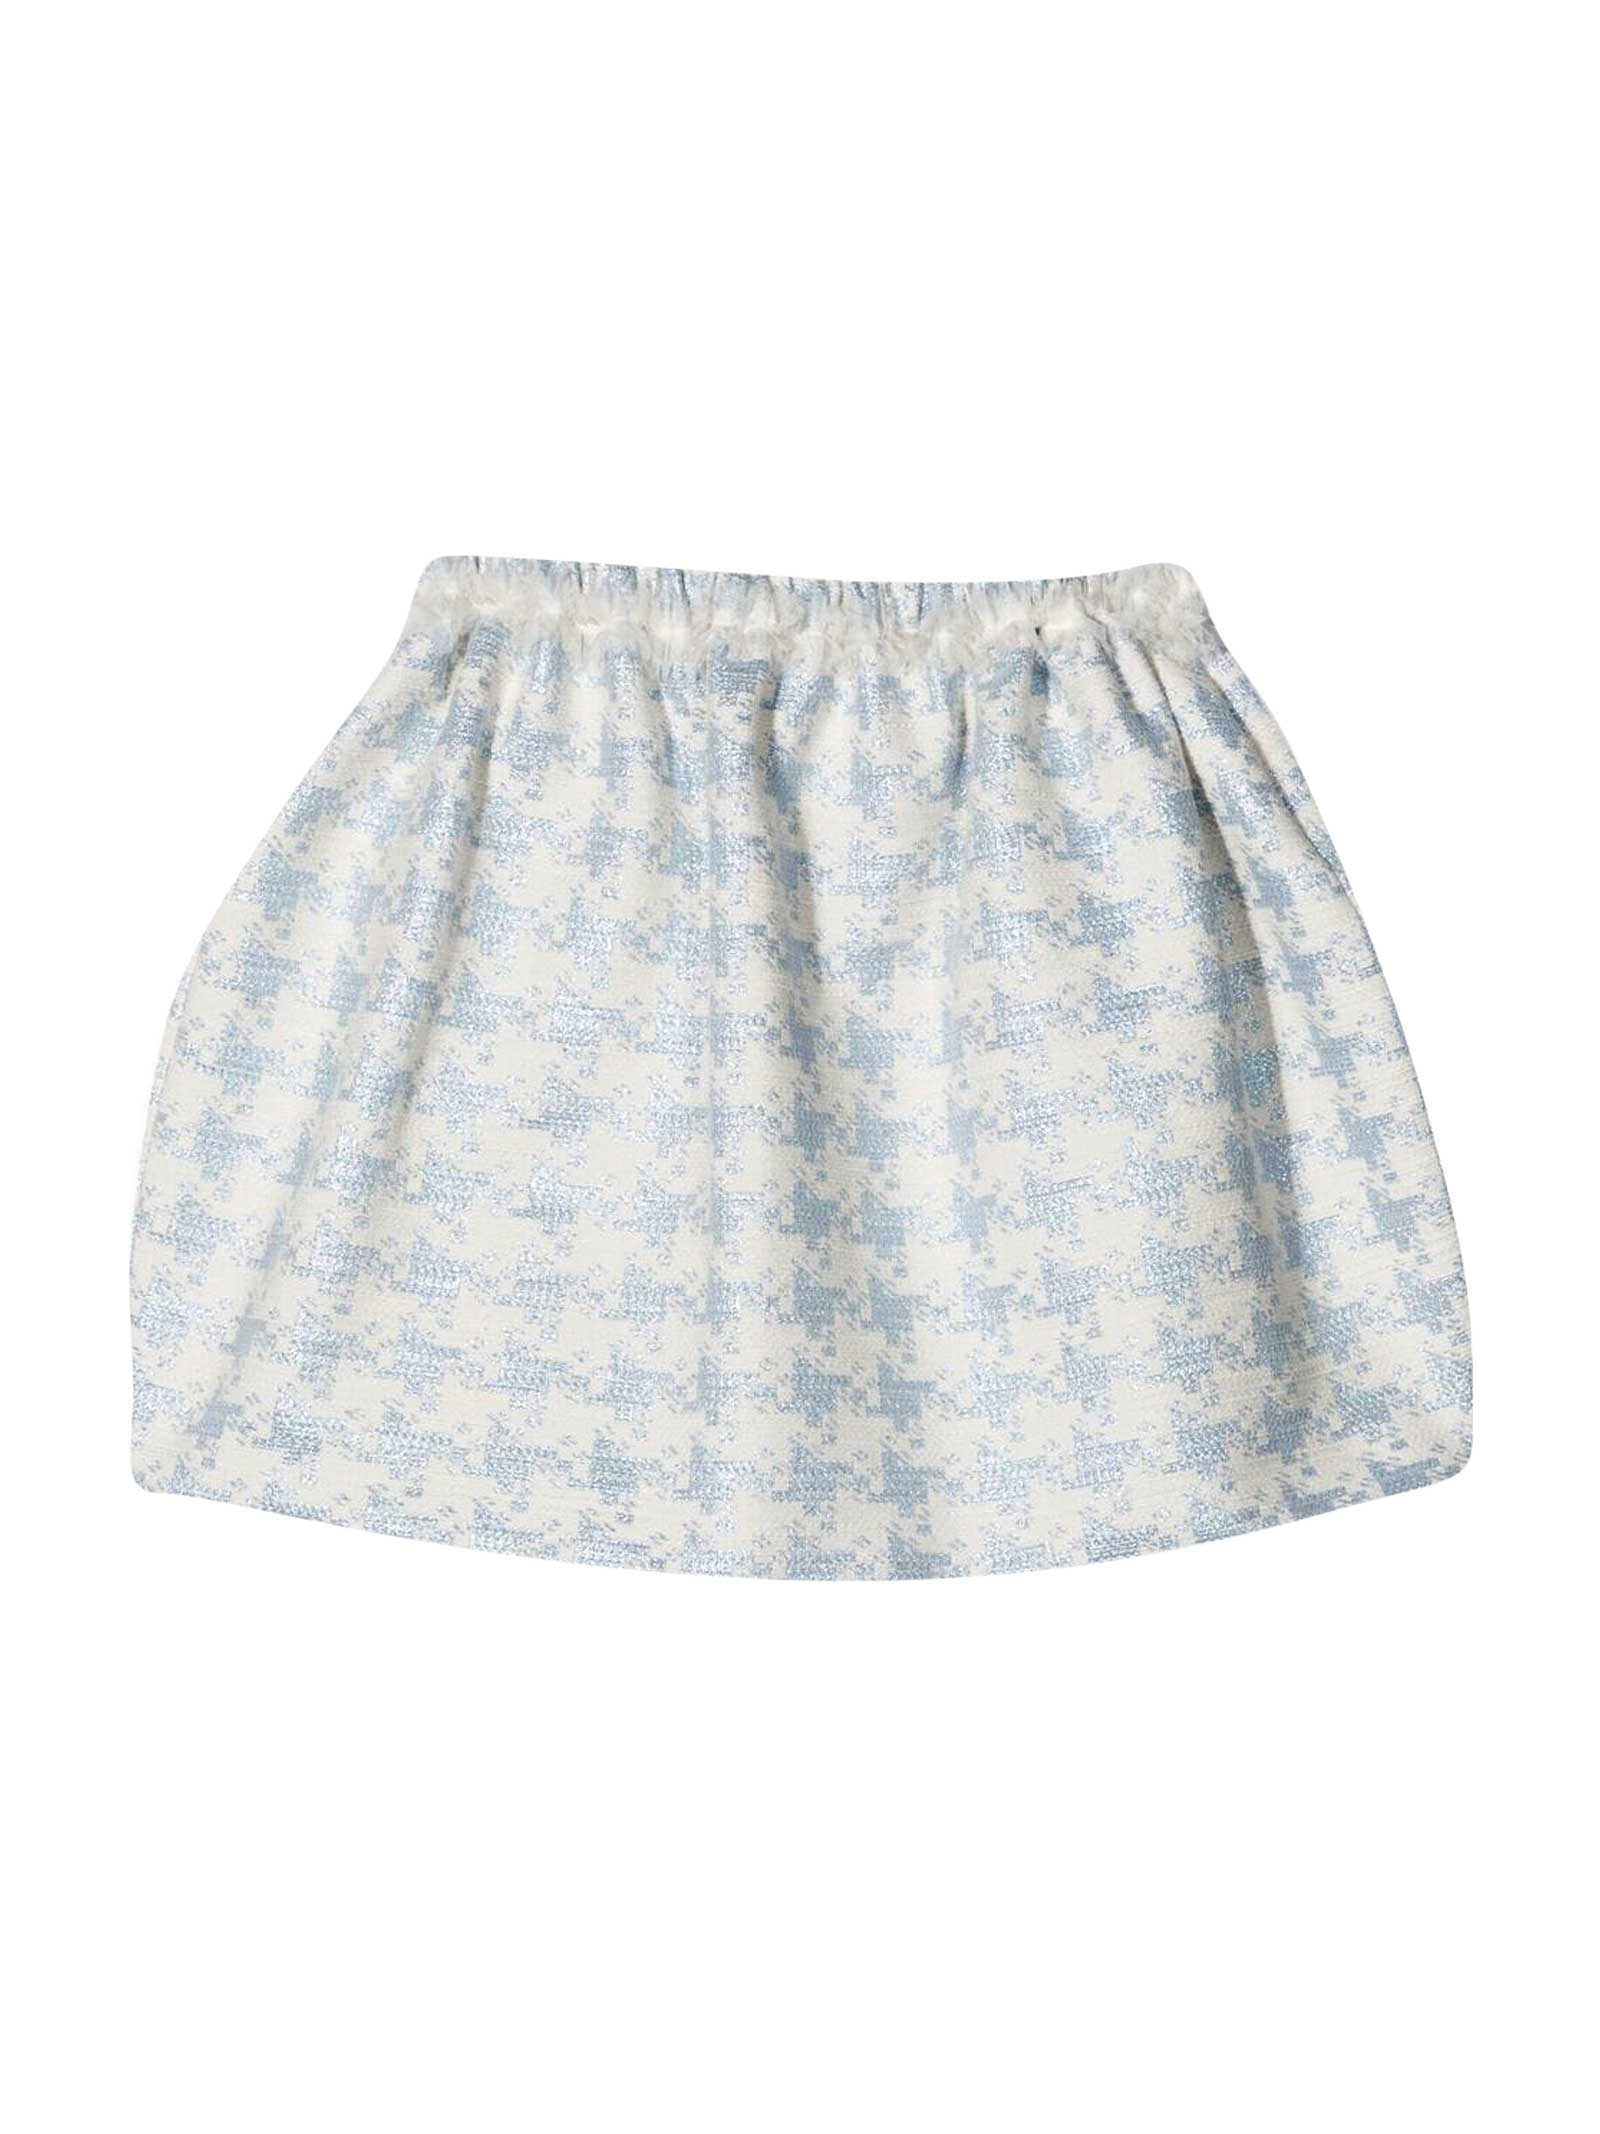 Miniskirt With Print